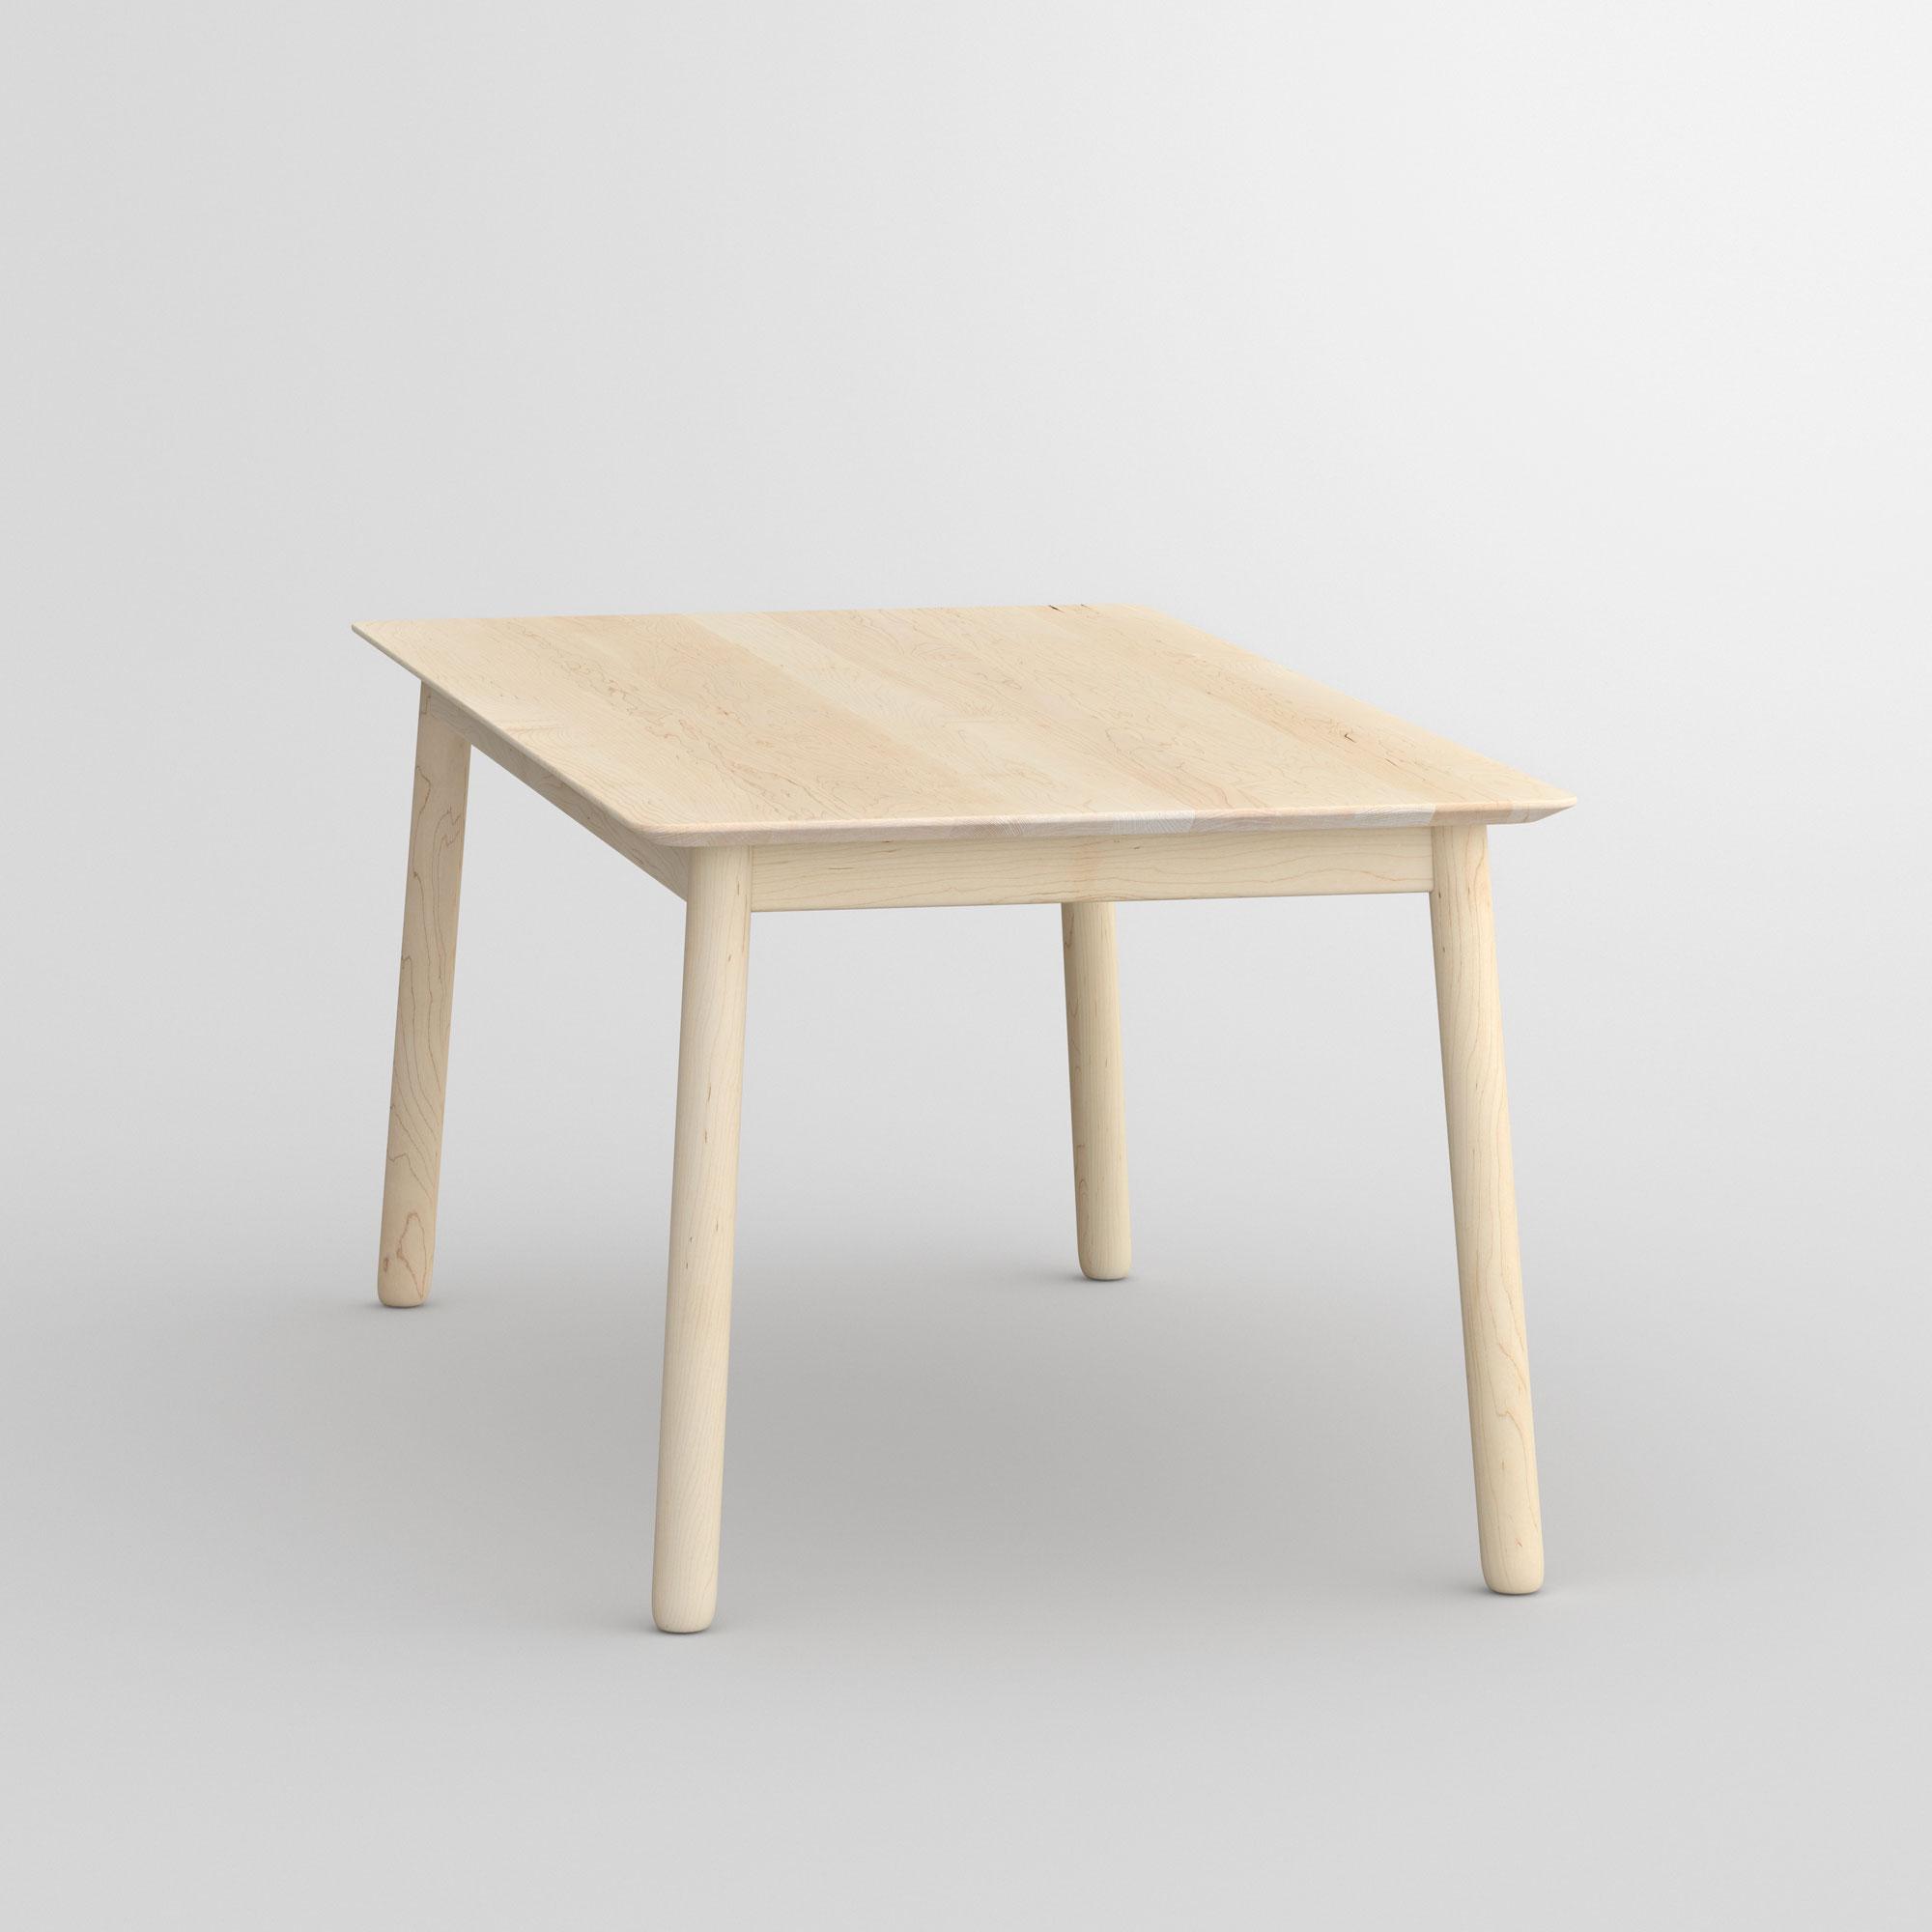 Loca Möbel style wood table loca vitamin design